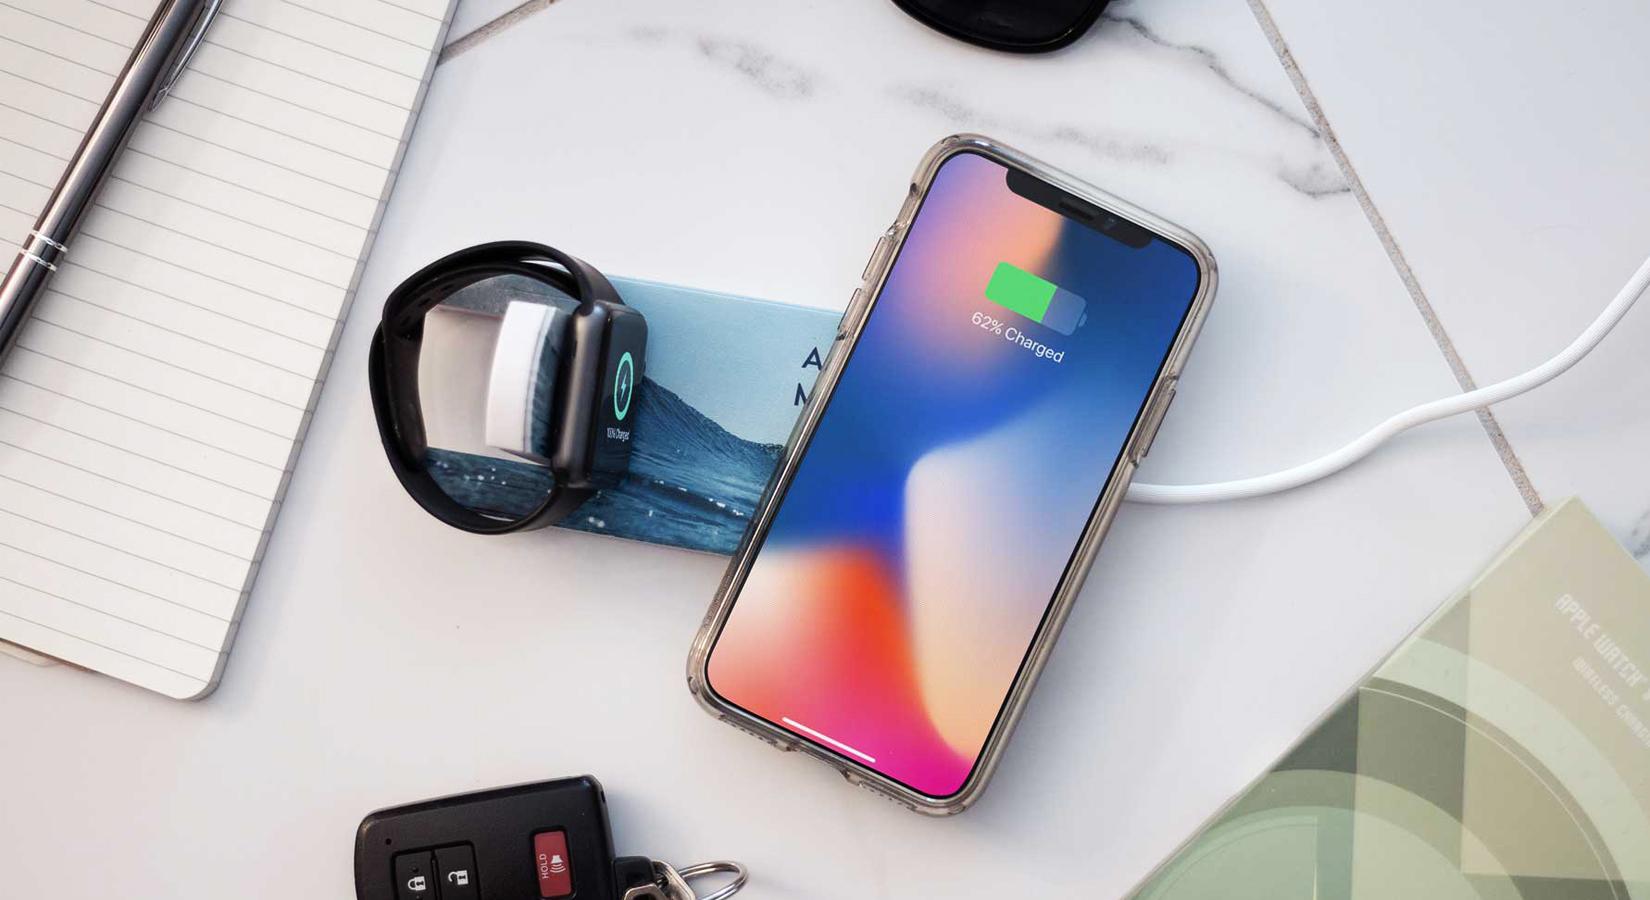 #25DaysOfGifting: Day 8 – Phone & Apple Watch Wireless Charging Pad